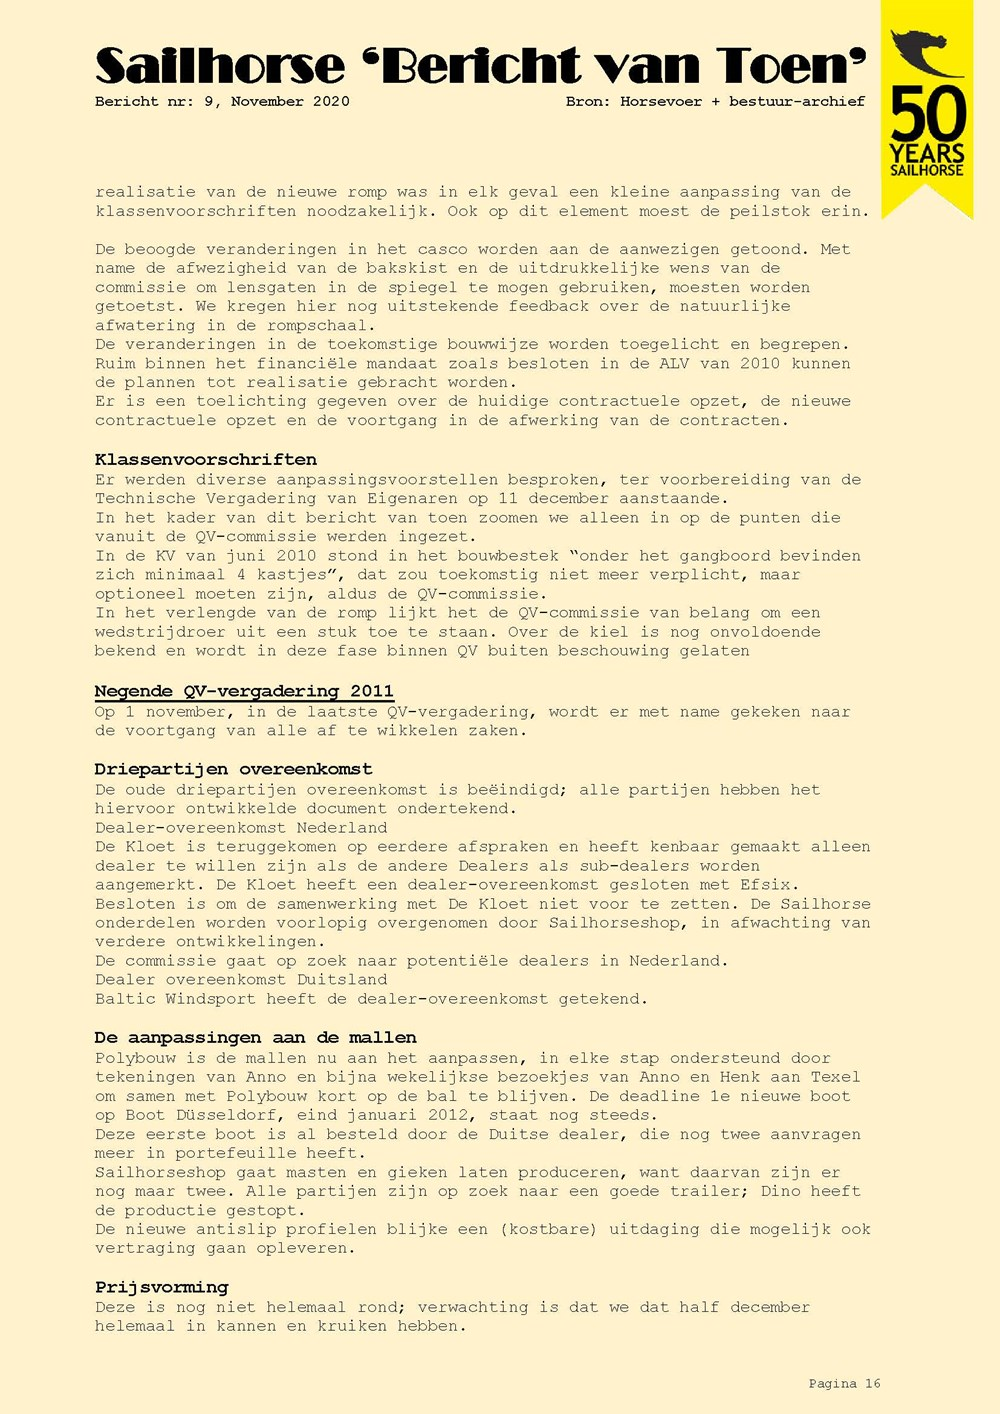 BvT09_Page_16.jpg